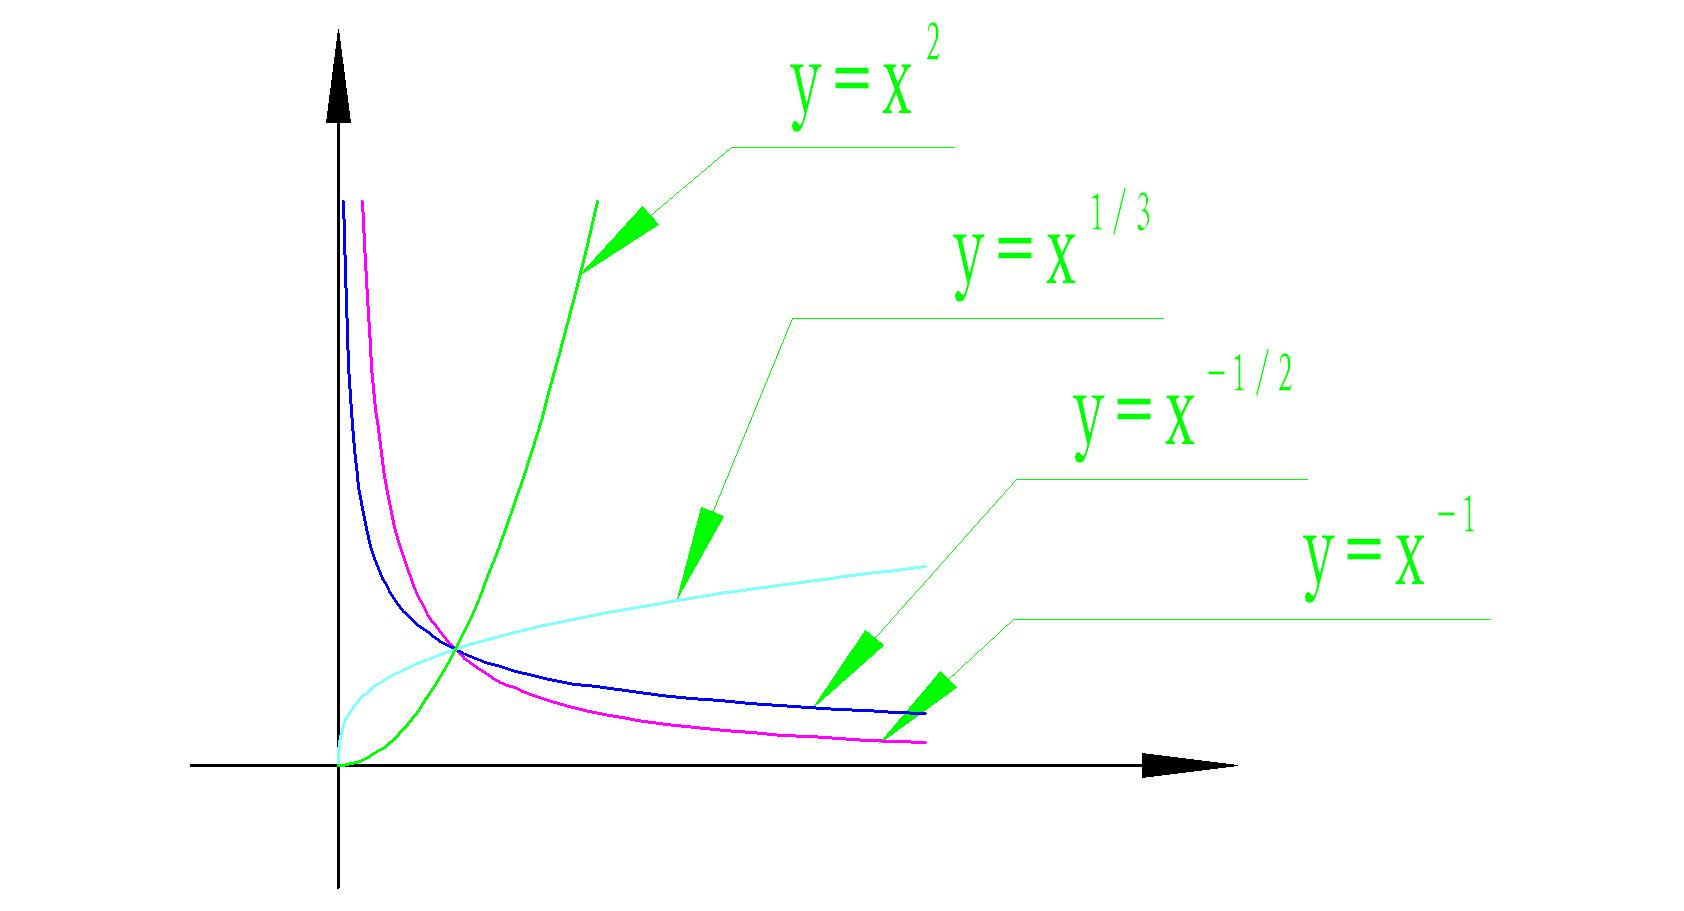 小人�y�a�.#y�*9��y�.Y���xn�)_函数y=x^(1/3)的图像